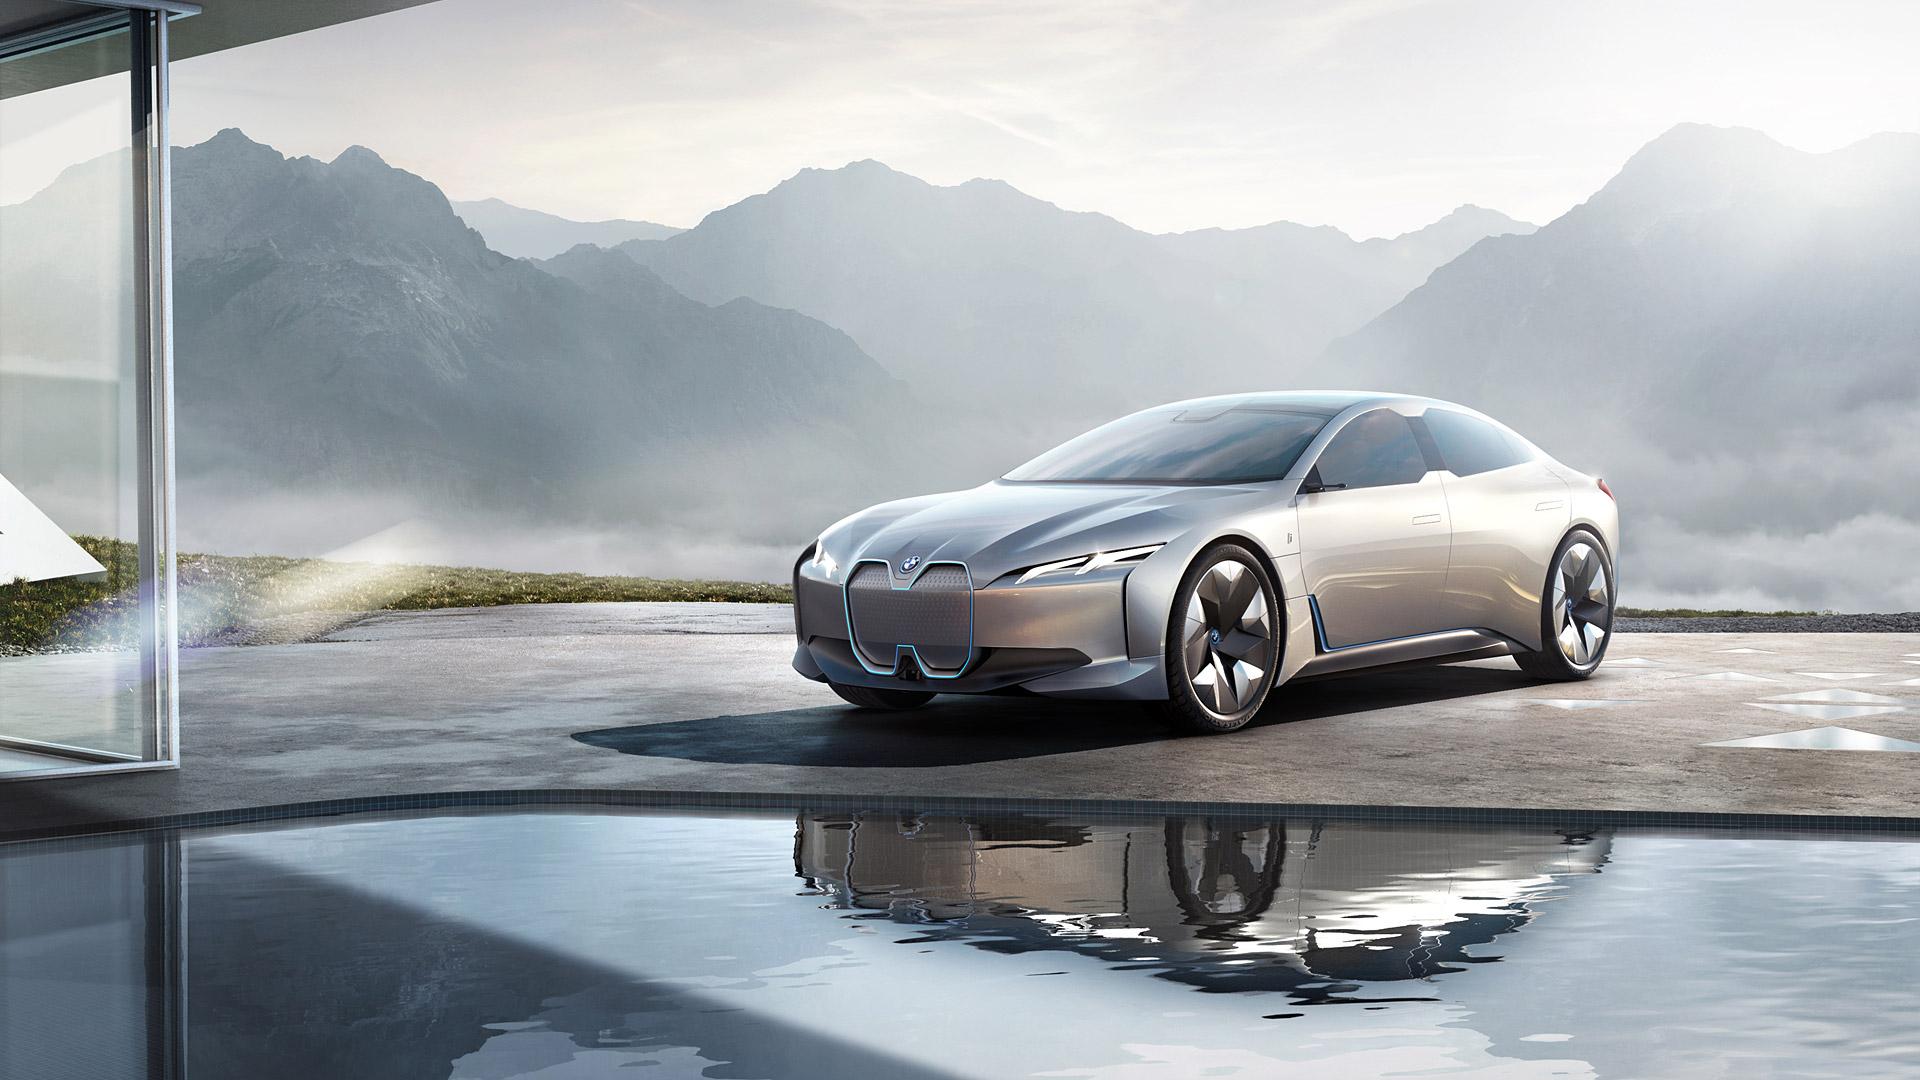 BMW Group unlocks renewable energy through mobility